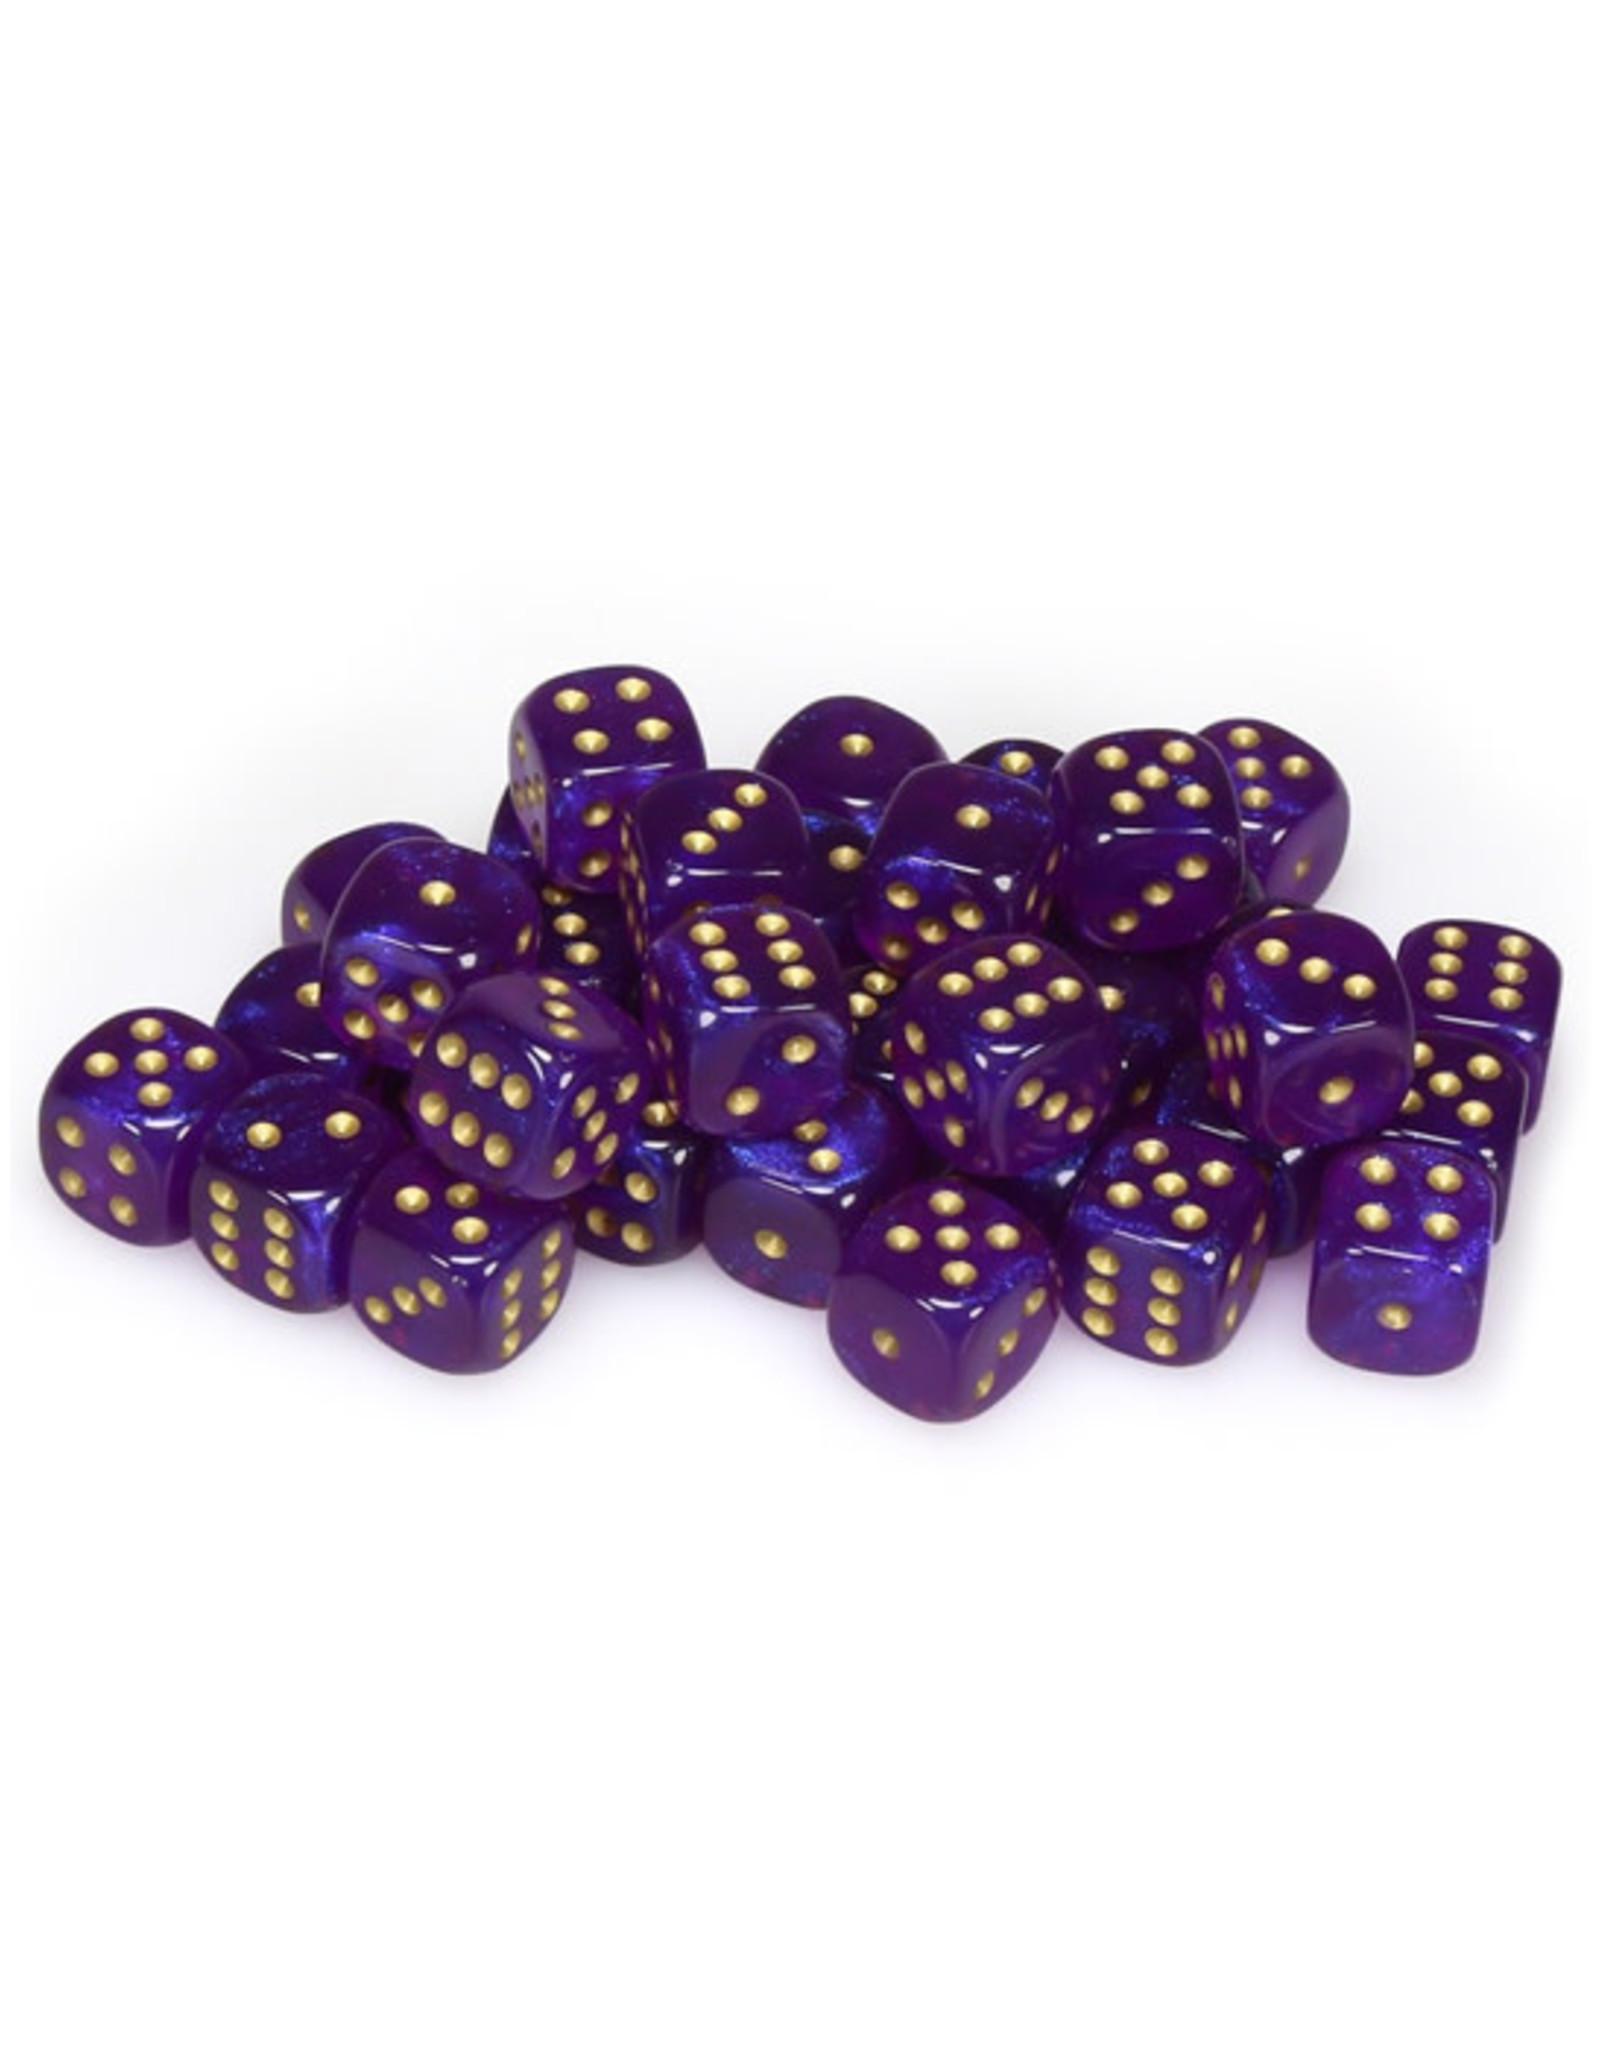 Chessex Chessex: 12mm D6 - Borealis - Royal Purple w/ Gold